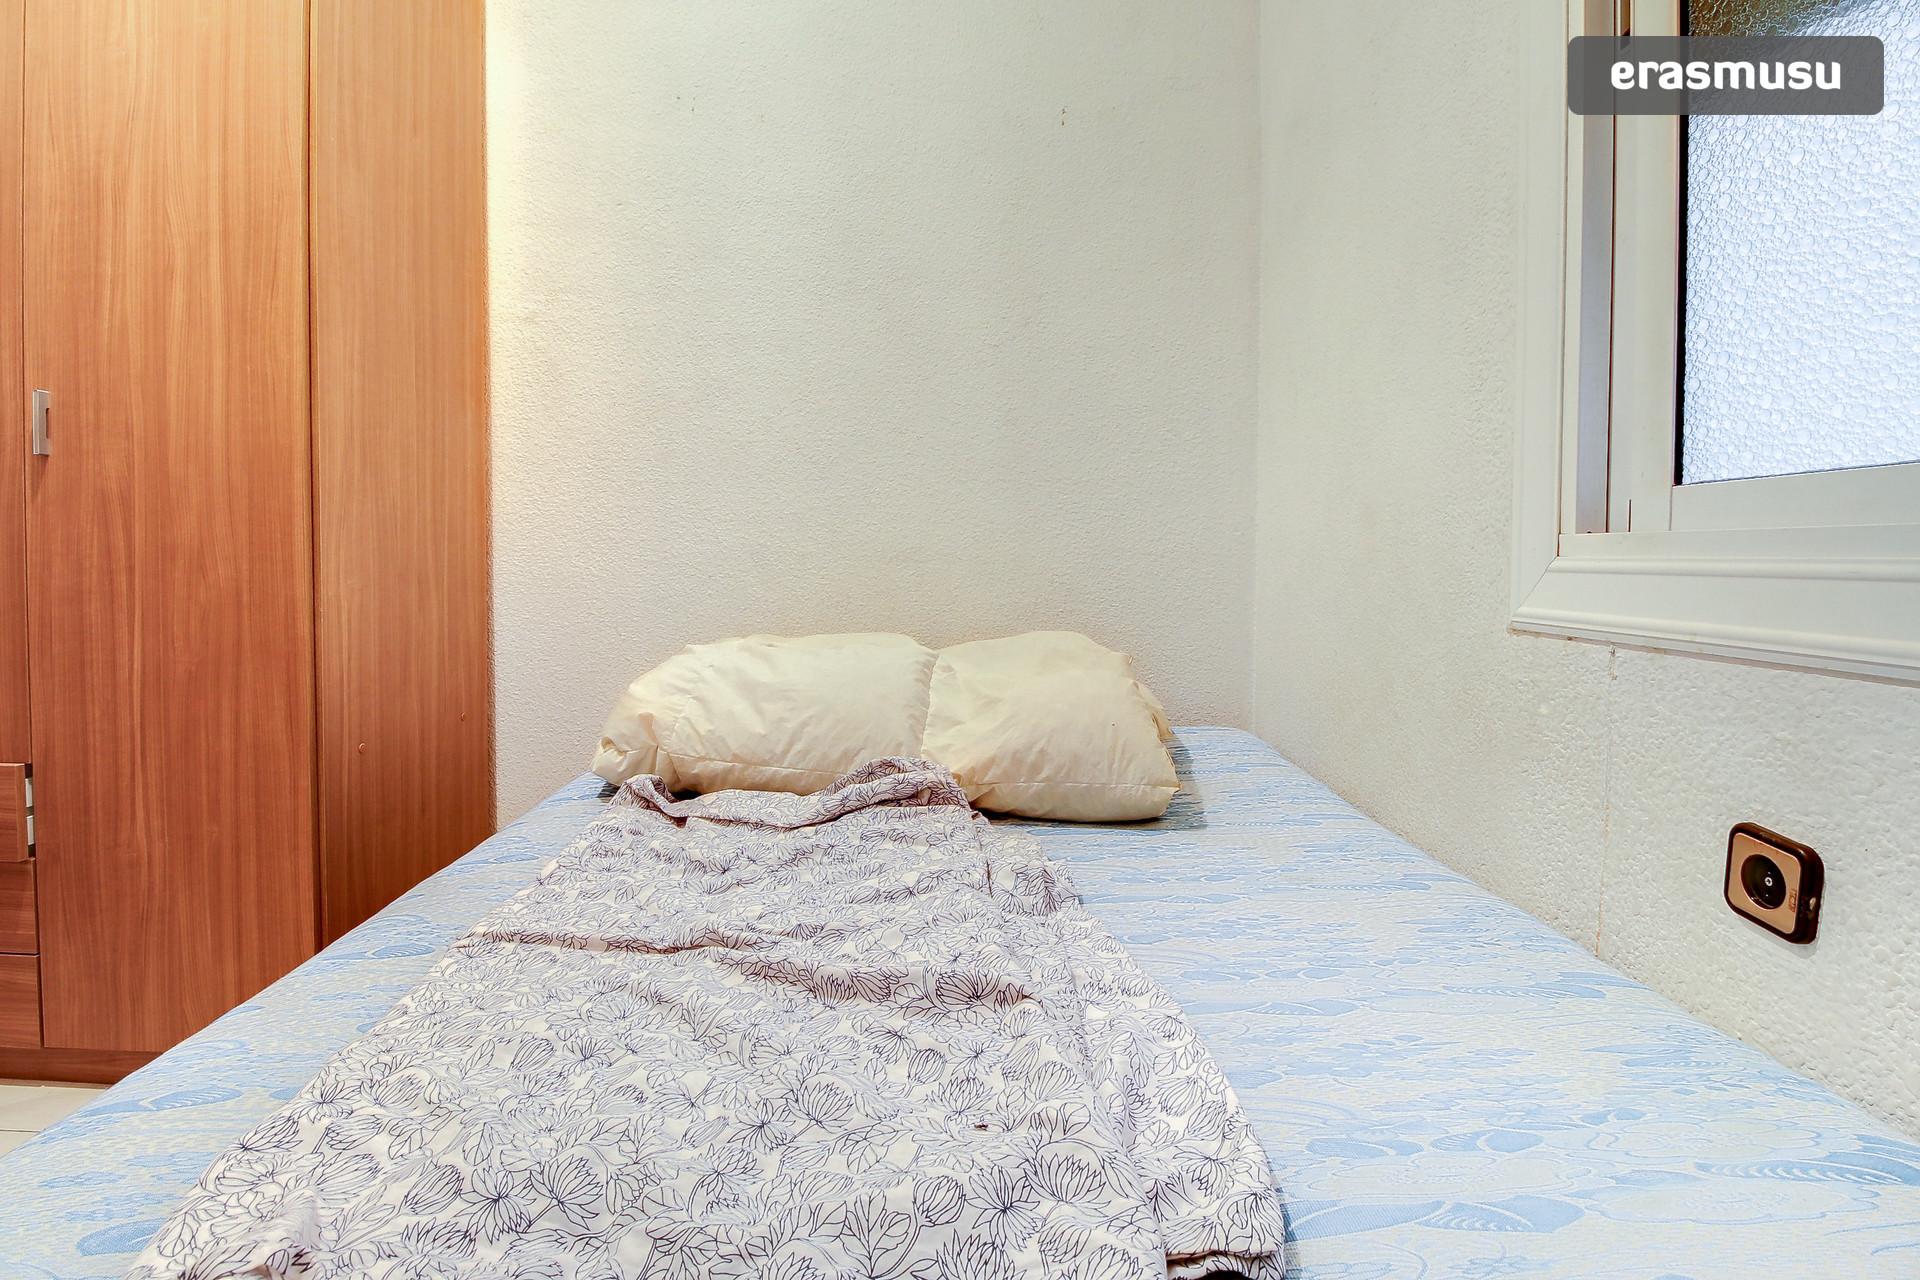 habitacion-chollo-barcelona-8d8c1cfbea4d